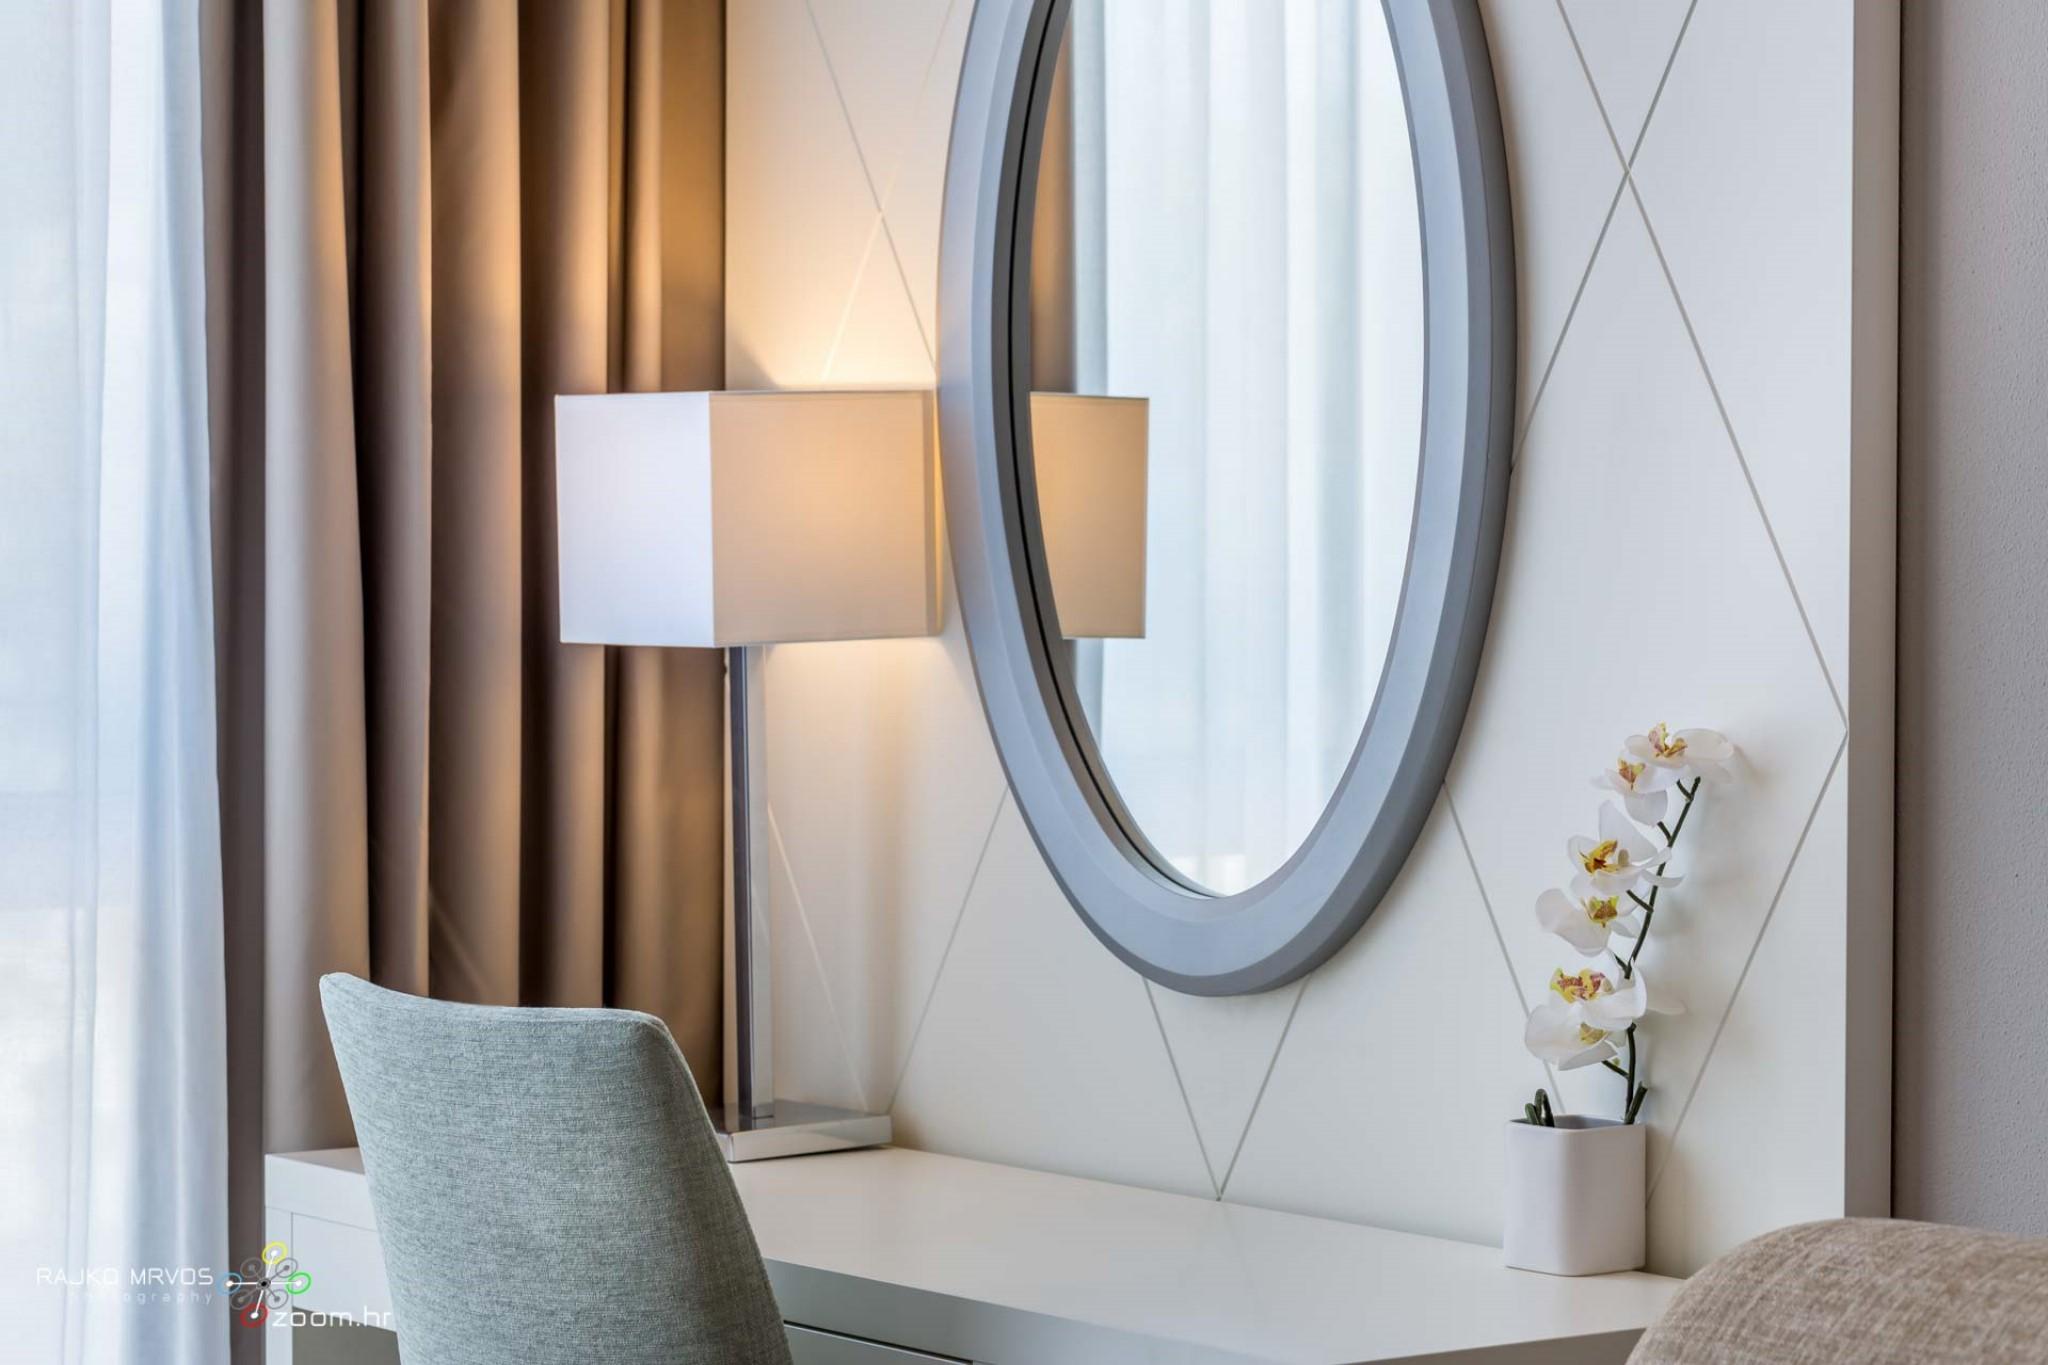 fotografiranje-interijera-fotograf-eksterijera-apartmana-vila-kuca-apartmani-Preelook-60